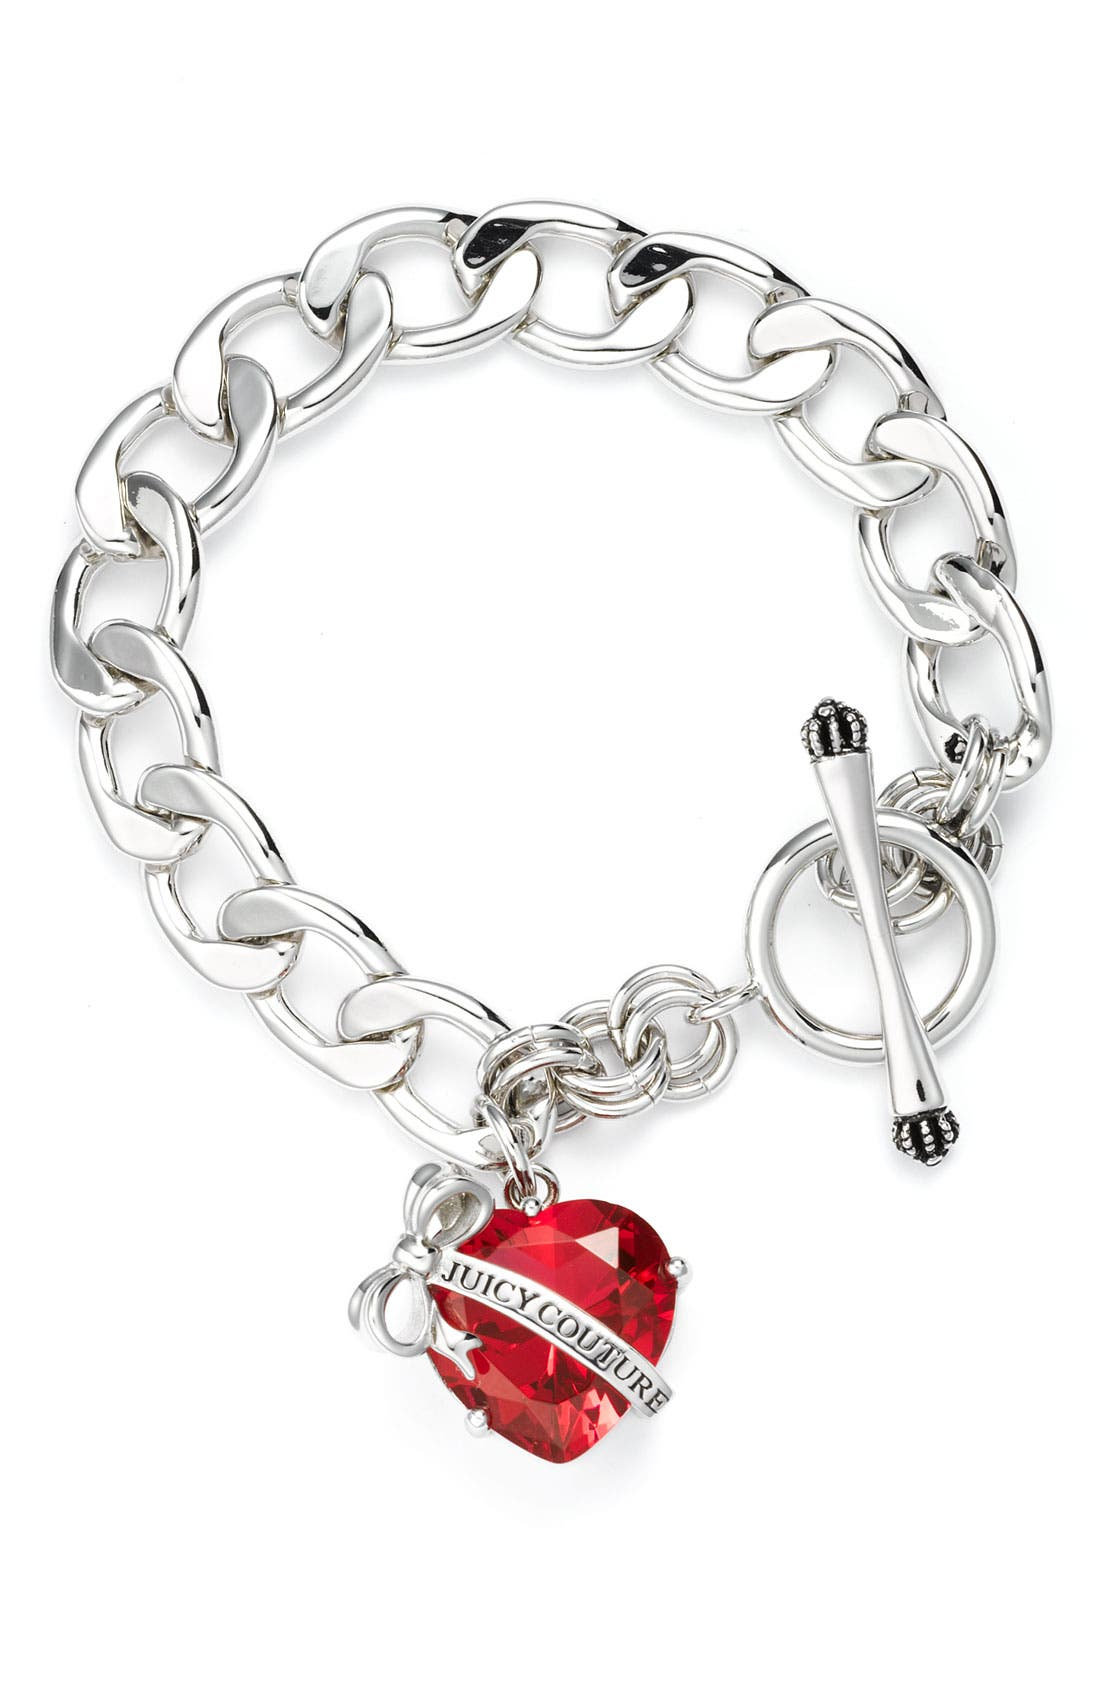 Alternate Image 1 Selected - Juicy Couture 'Technicolor Dreams' Starter Charm Bracelet